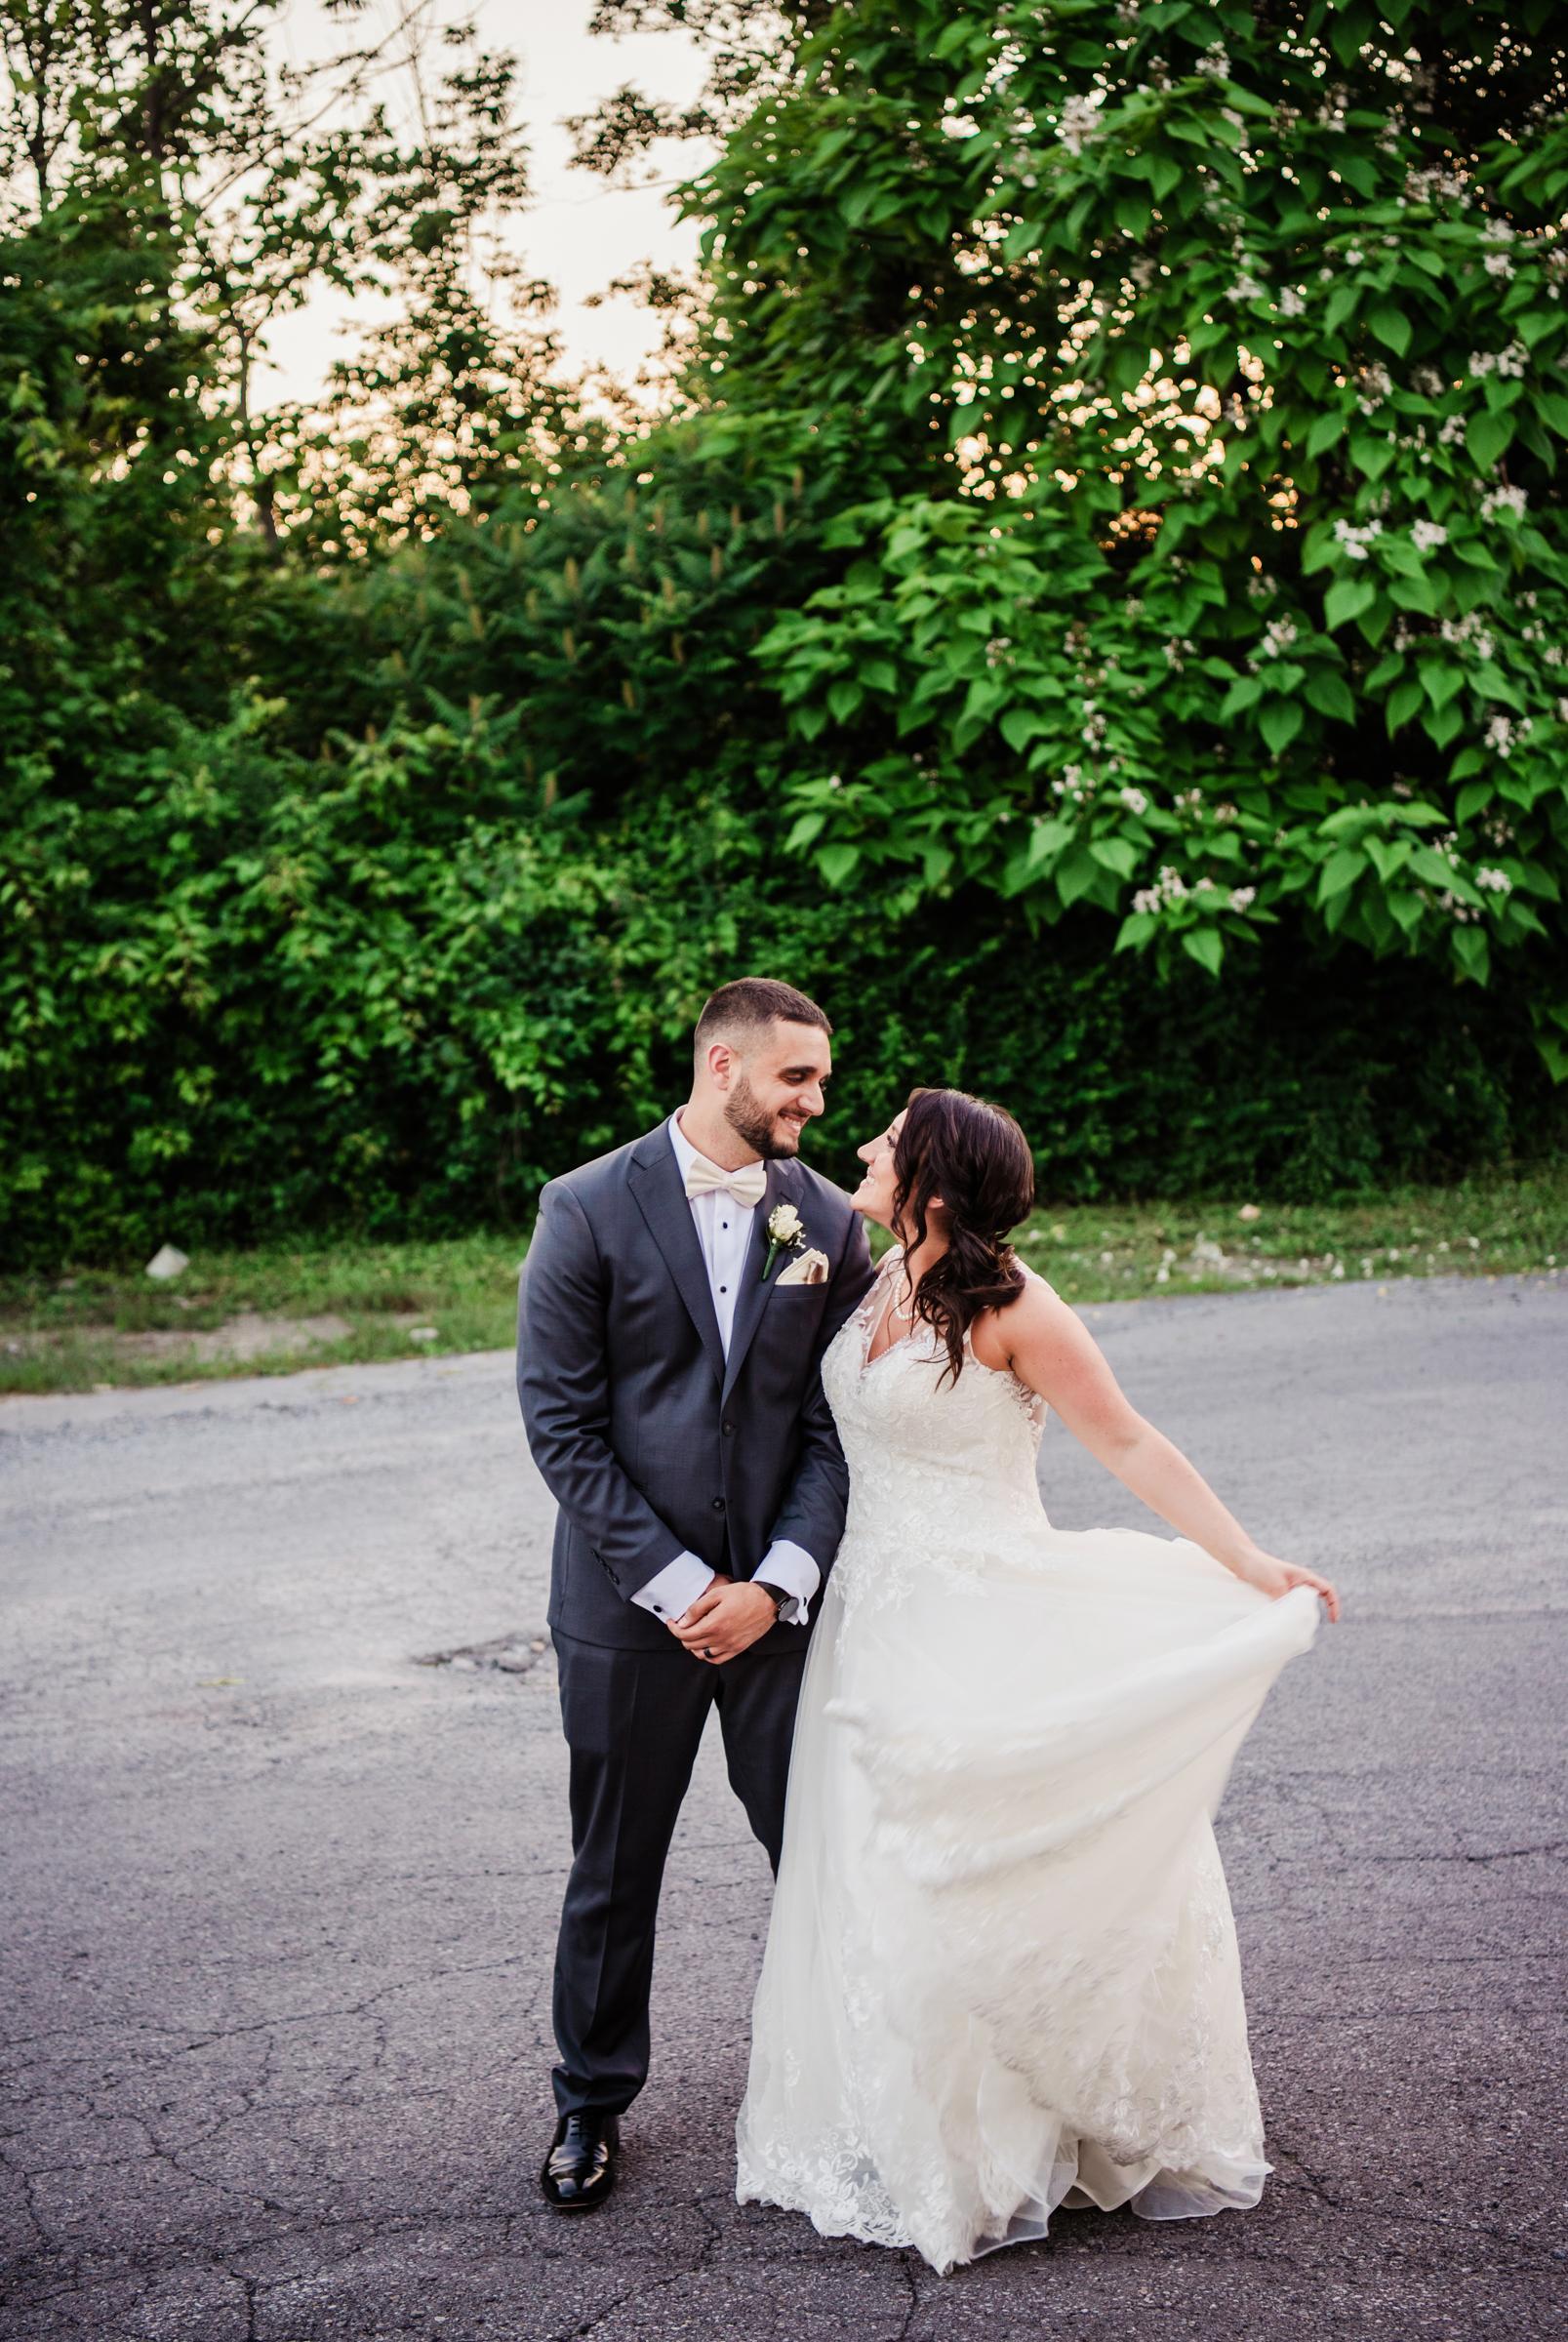 Historic_Old_St_Johns_Church_Valentinos_Banquet_Hall_Central_NY_Wedding_JILL_STUDIO_Rochester_NY_Photographer_DSC_6893.jpg